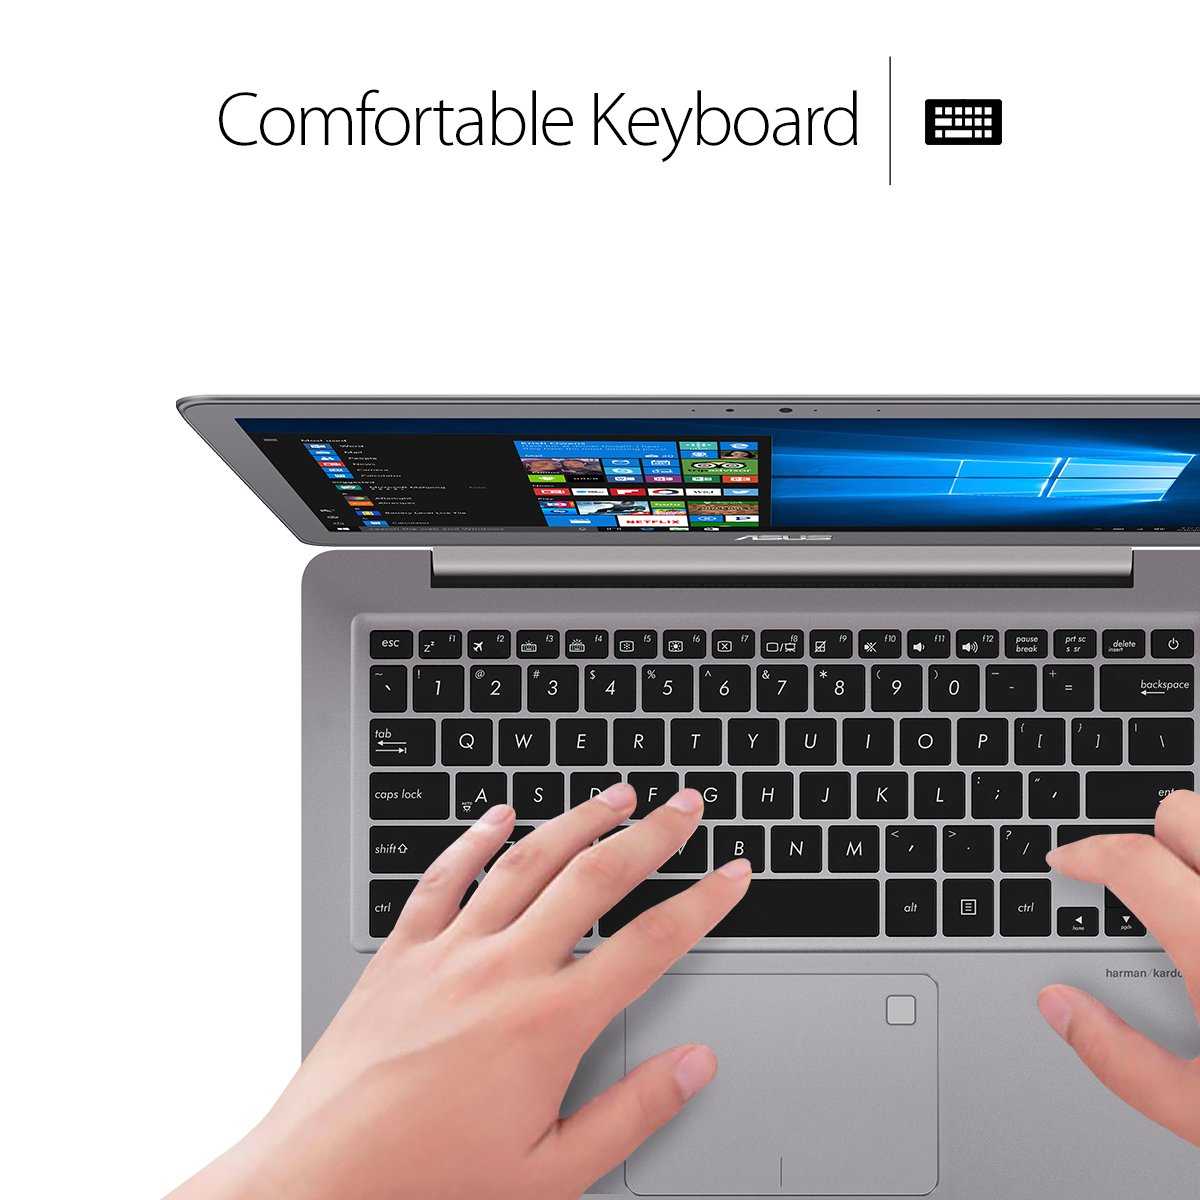 ASUS ZenBook UX330UA-AH54 13.3-inch LCD Ultra-Slim Laptop (Core i5 Processor, 8GB DDR3, 256GB SSD, Windows 10) w/ Harman Kardon Audio, Backlit keyboard, Fingerprint Reader by Asus (Image #4)